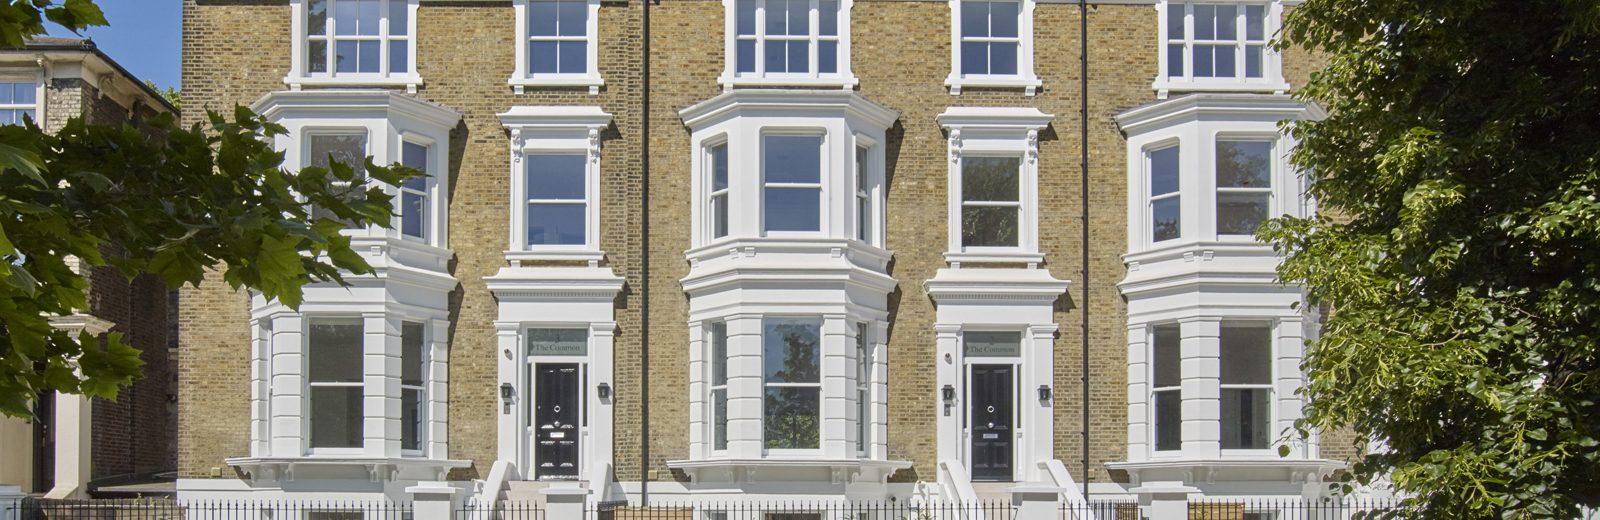 Speculative Development - London